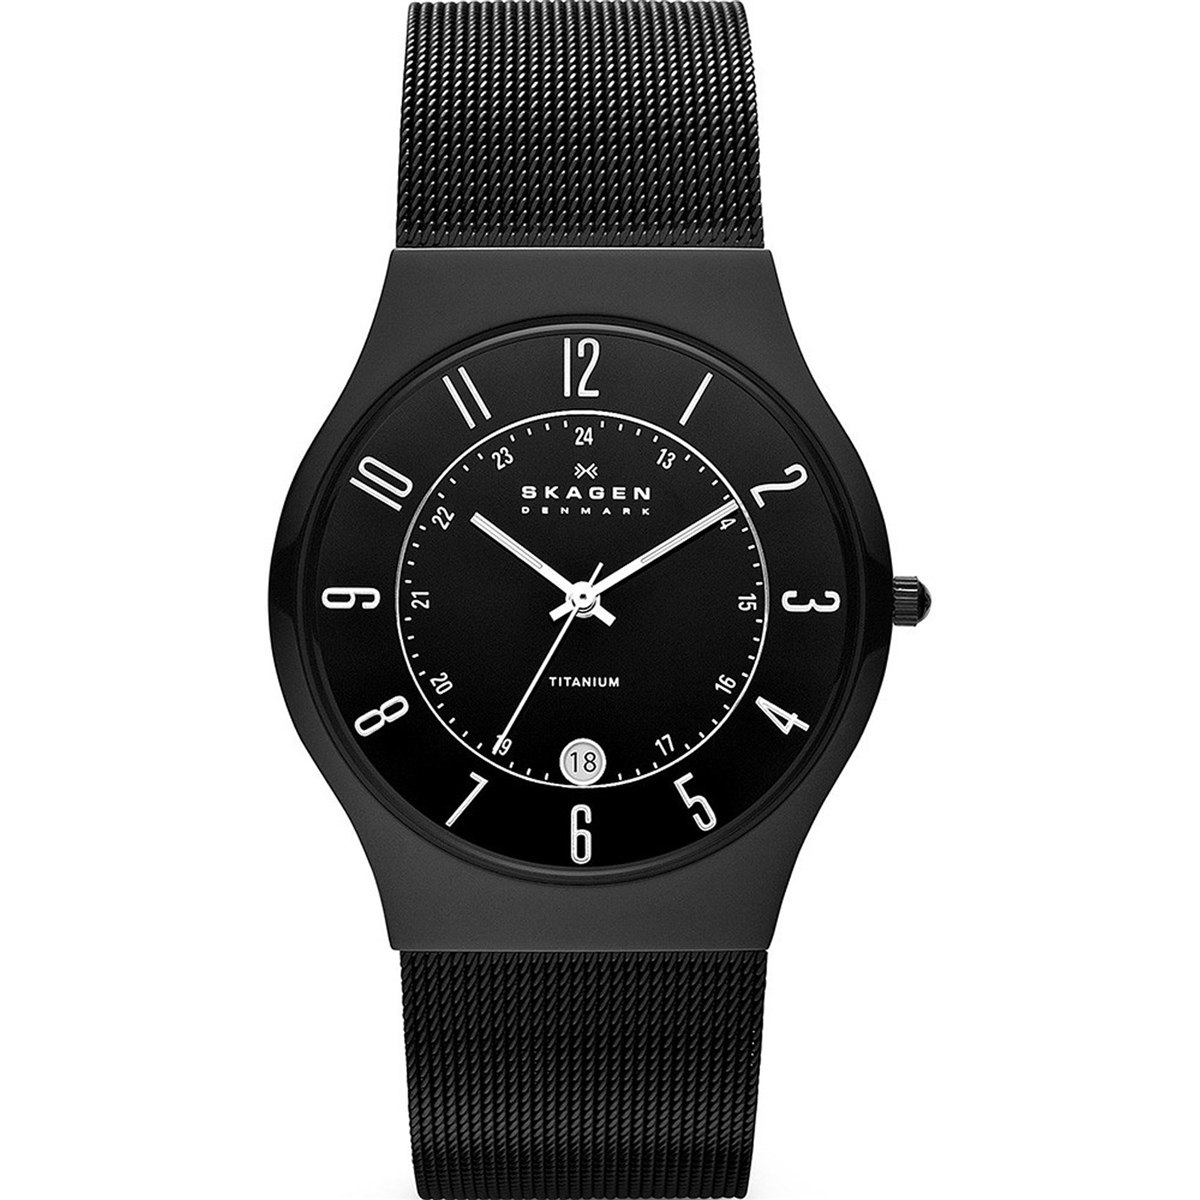 Relógio Skagen Masculino Titanium Analógico 233xltmb - R  999,99 em ... 39132eb0bb